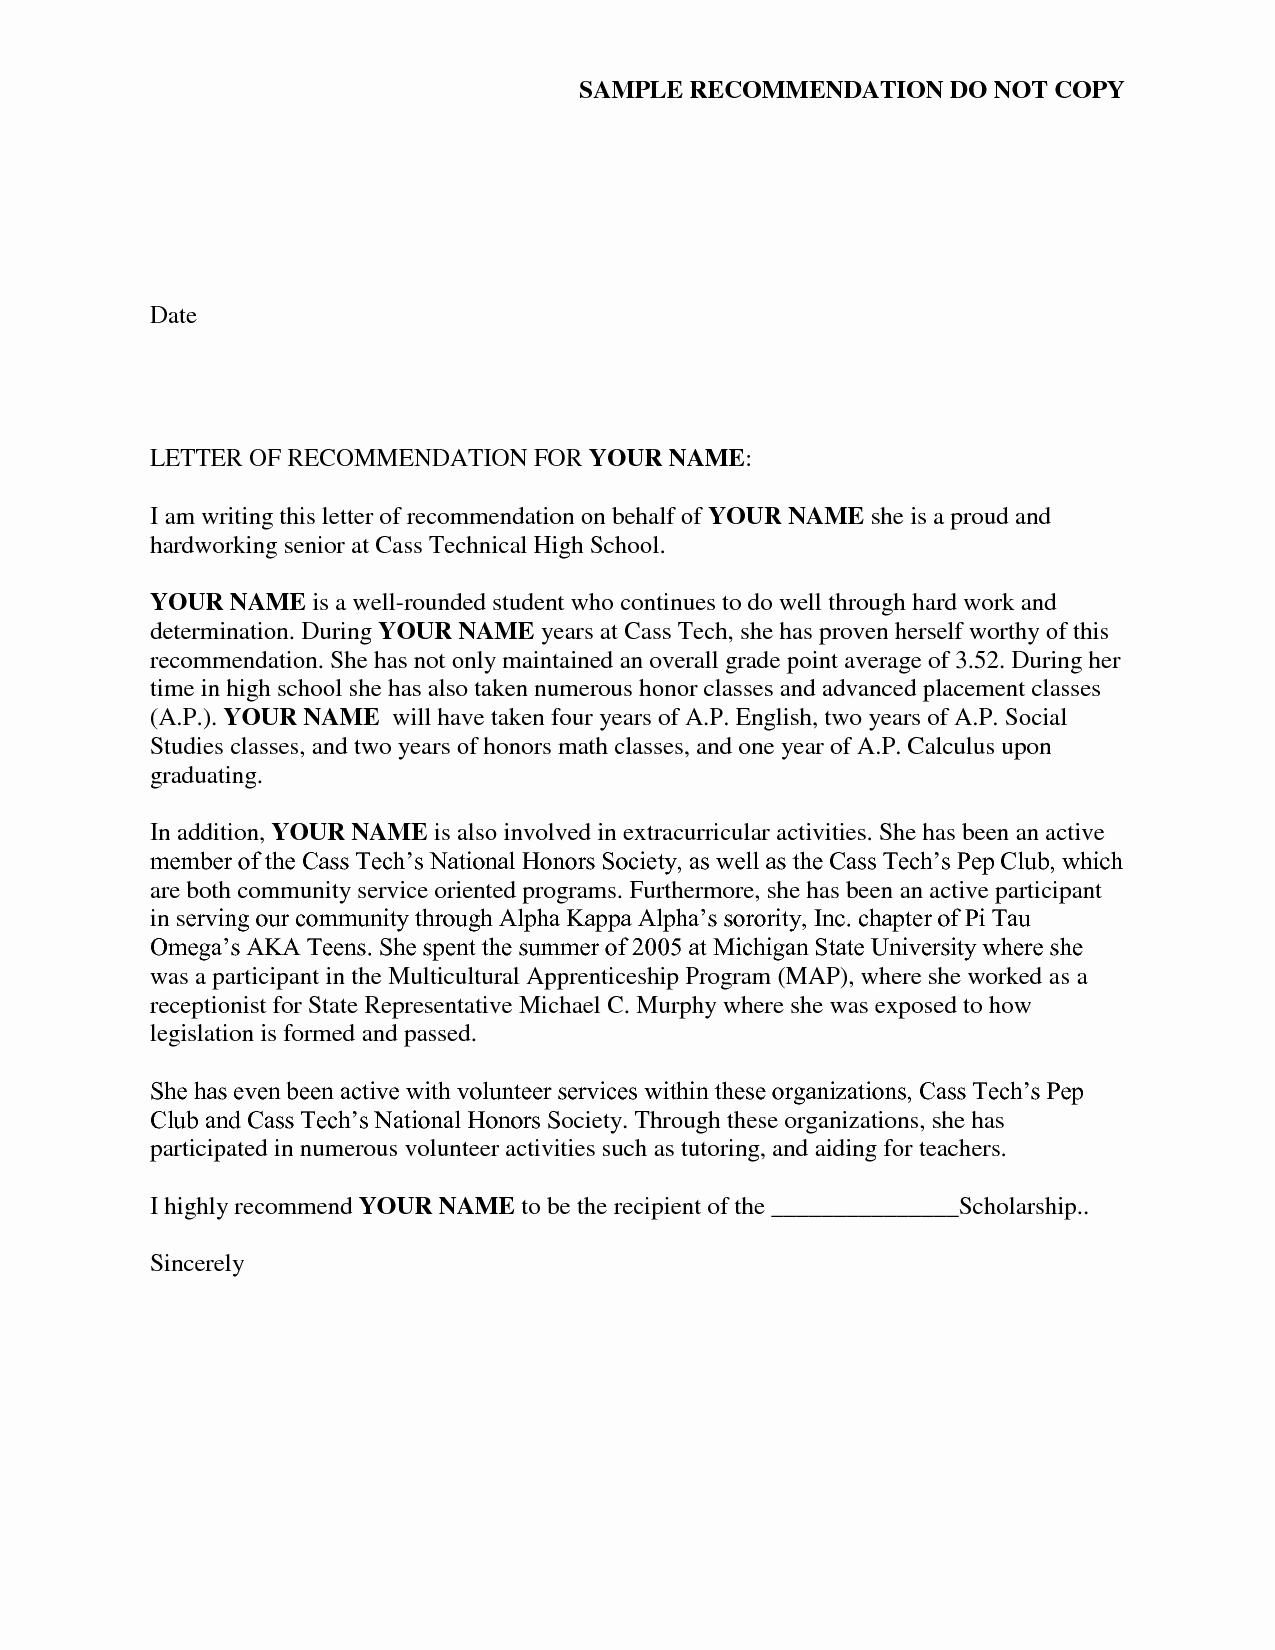 Recommendation Letter for sorority Luxury Reference Letter Of Re Mendation Sample